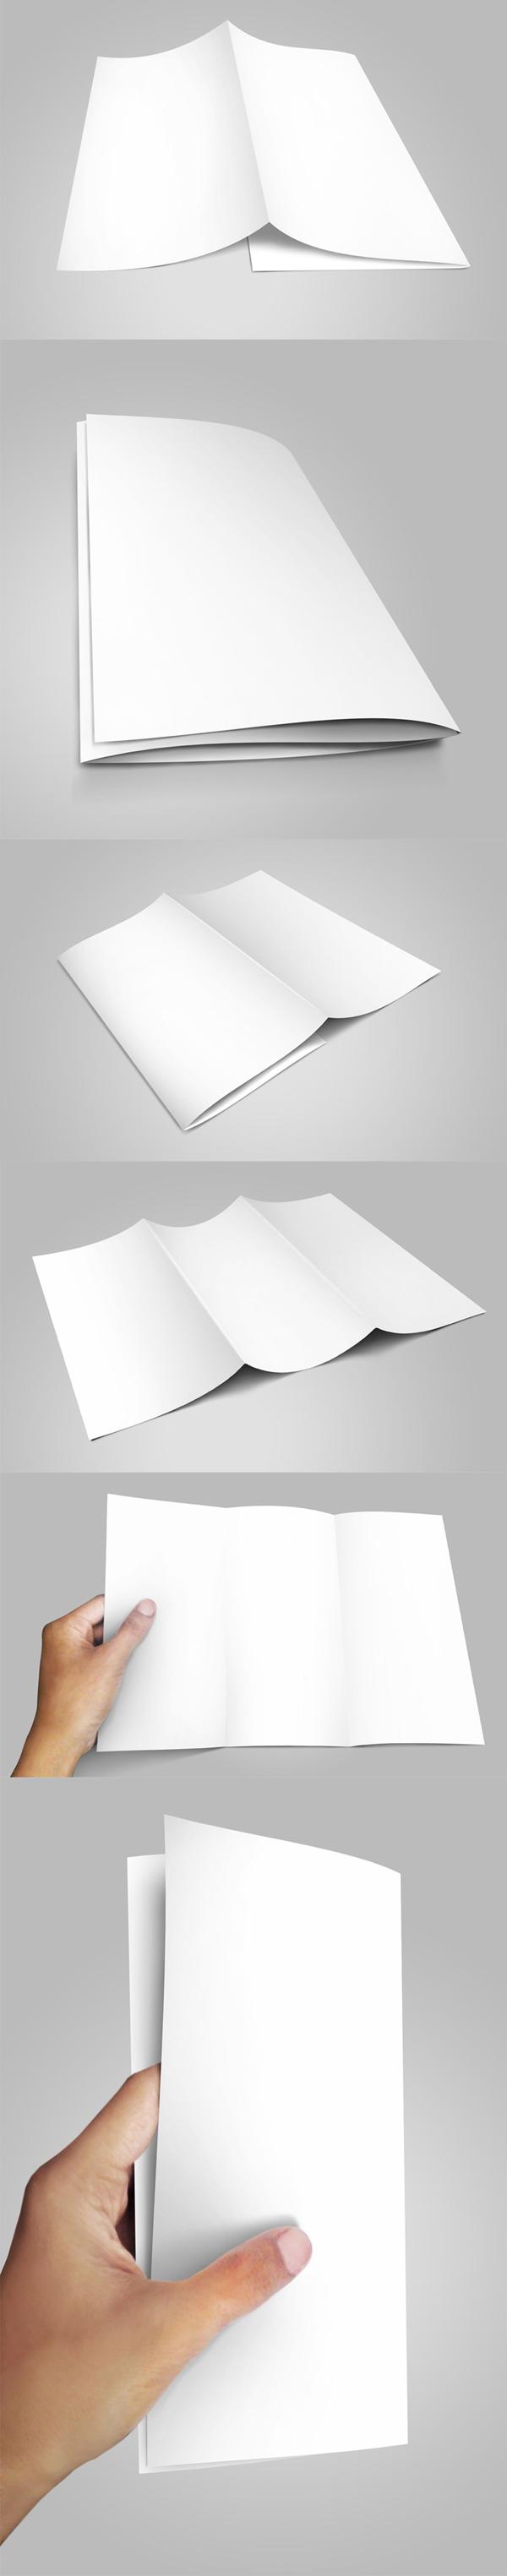 17_Trifold Brochure Mockup